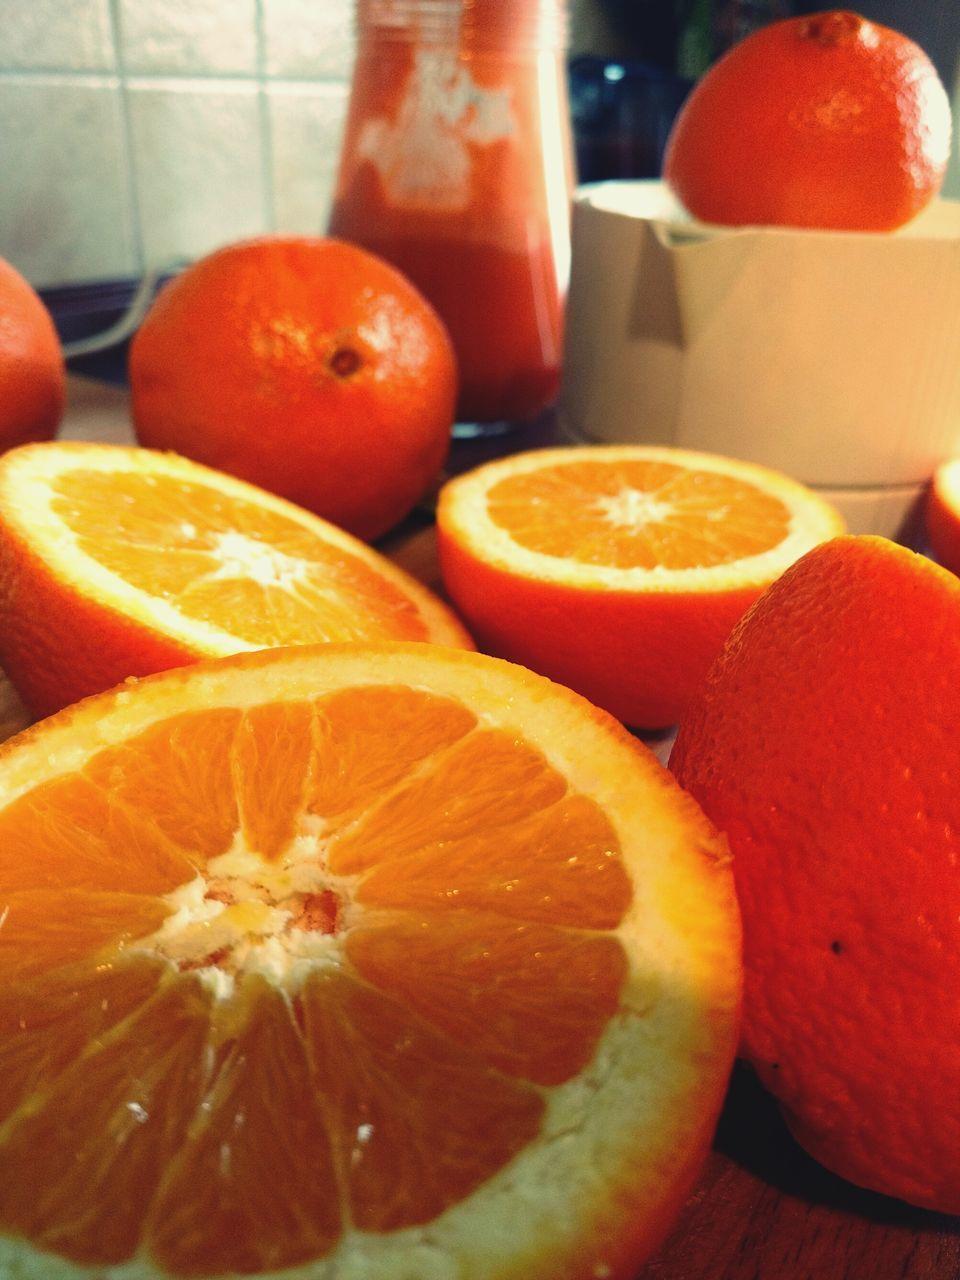 orange - fruit, fruit, citrus fruit, freshness, healthy eating, food and drink, orange color, slice, food, grapefruit, cross section, blood orange, indoors, close-up, no people, vitamin c, table, day